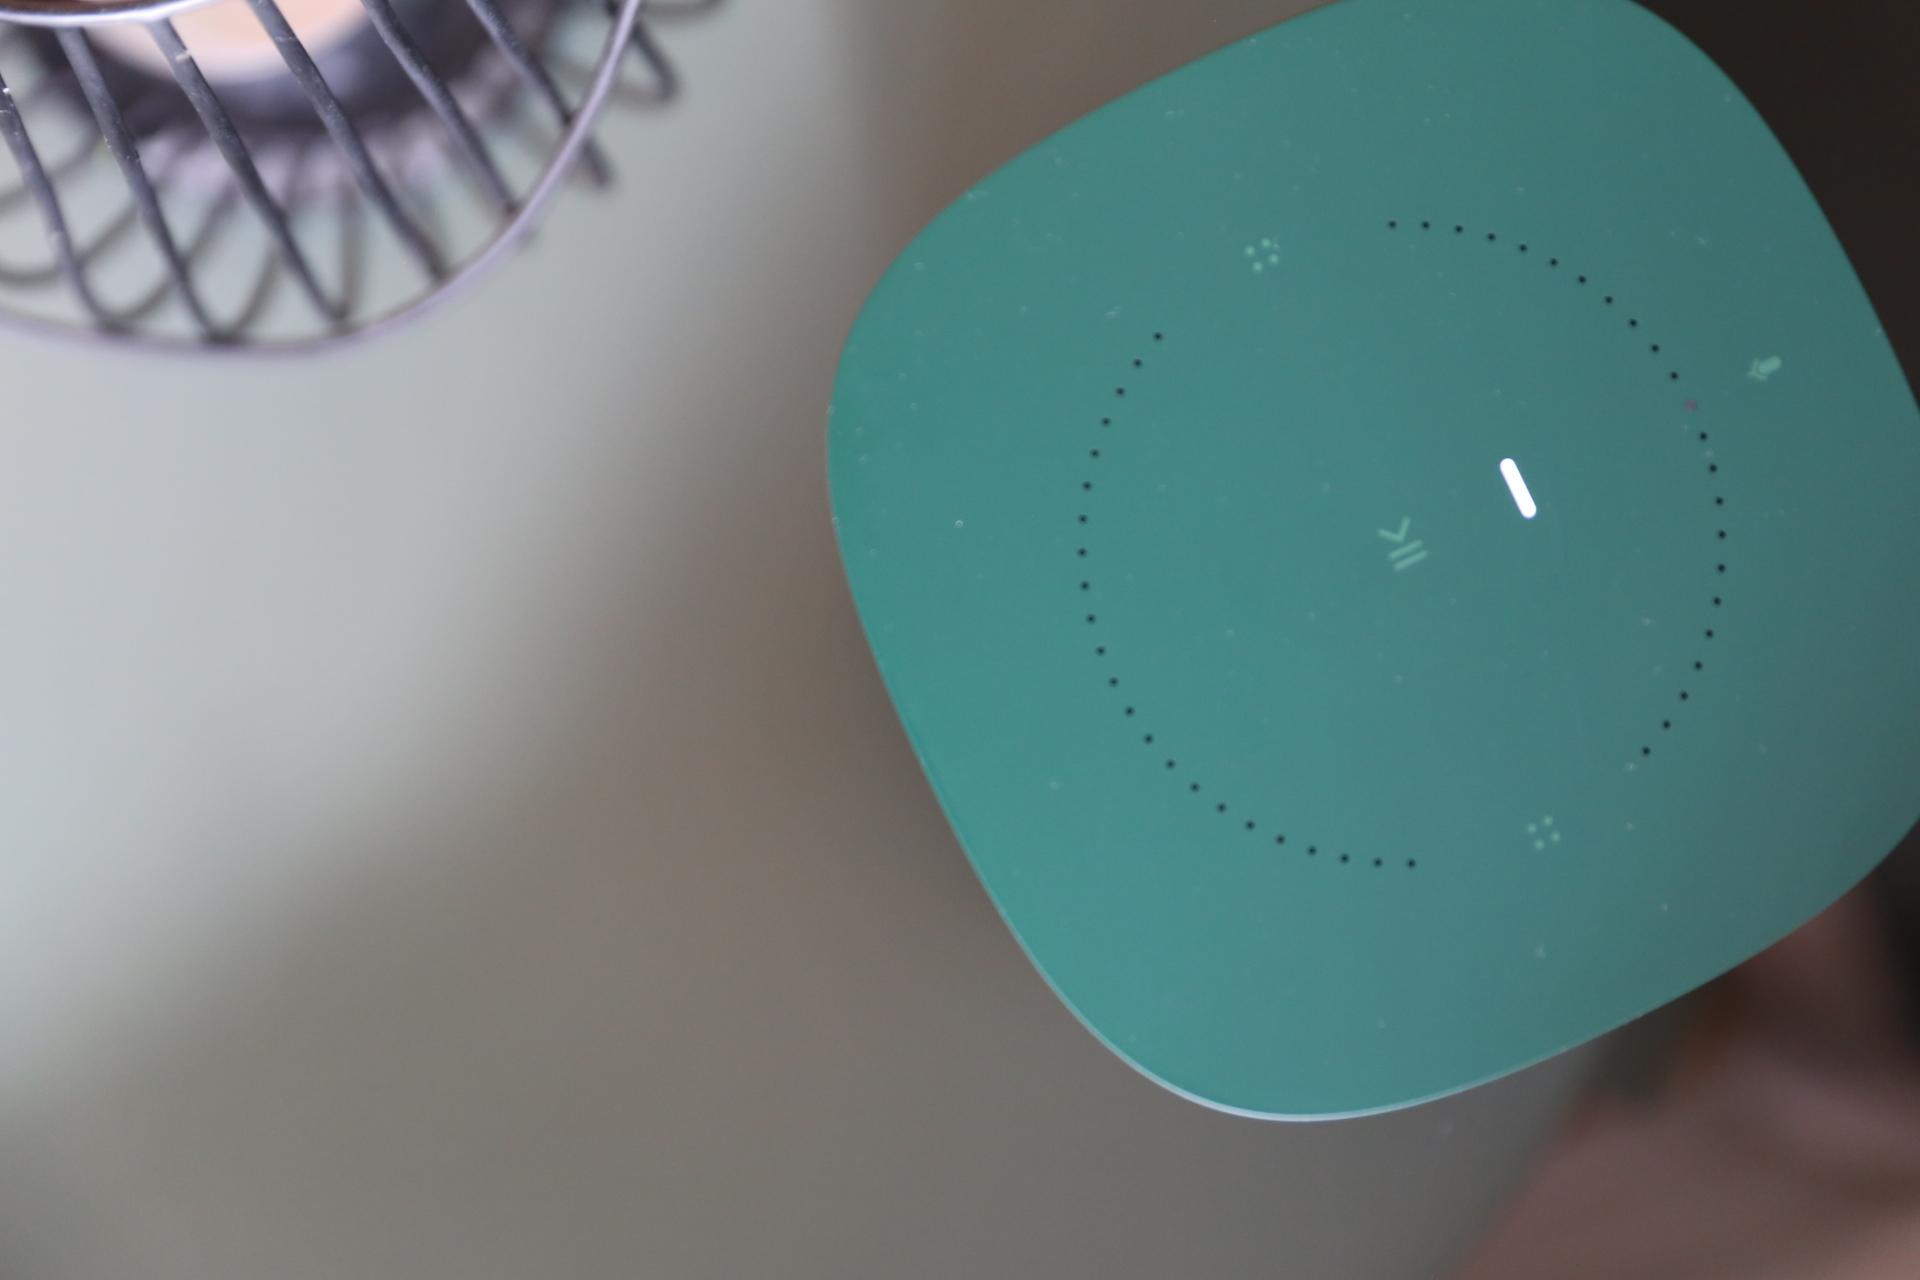 Detail Sonos Limited Edition HAY oben